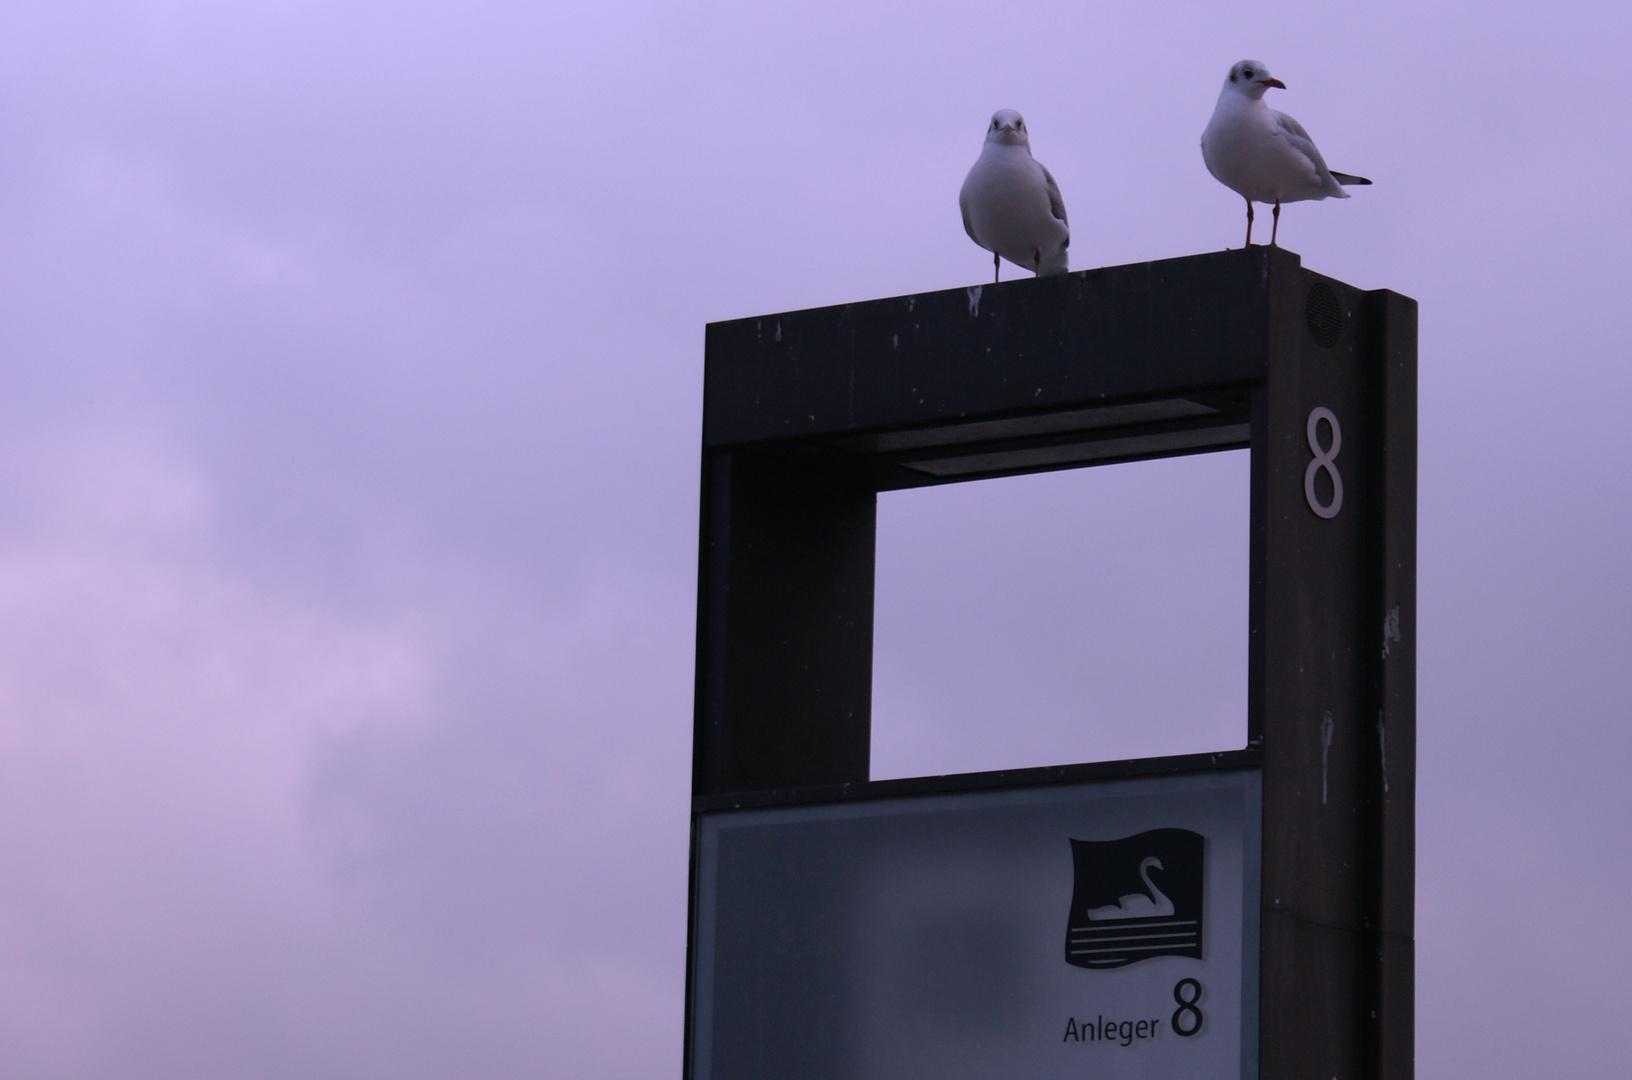 Anleger 8 - Hamburg